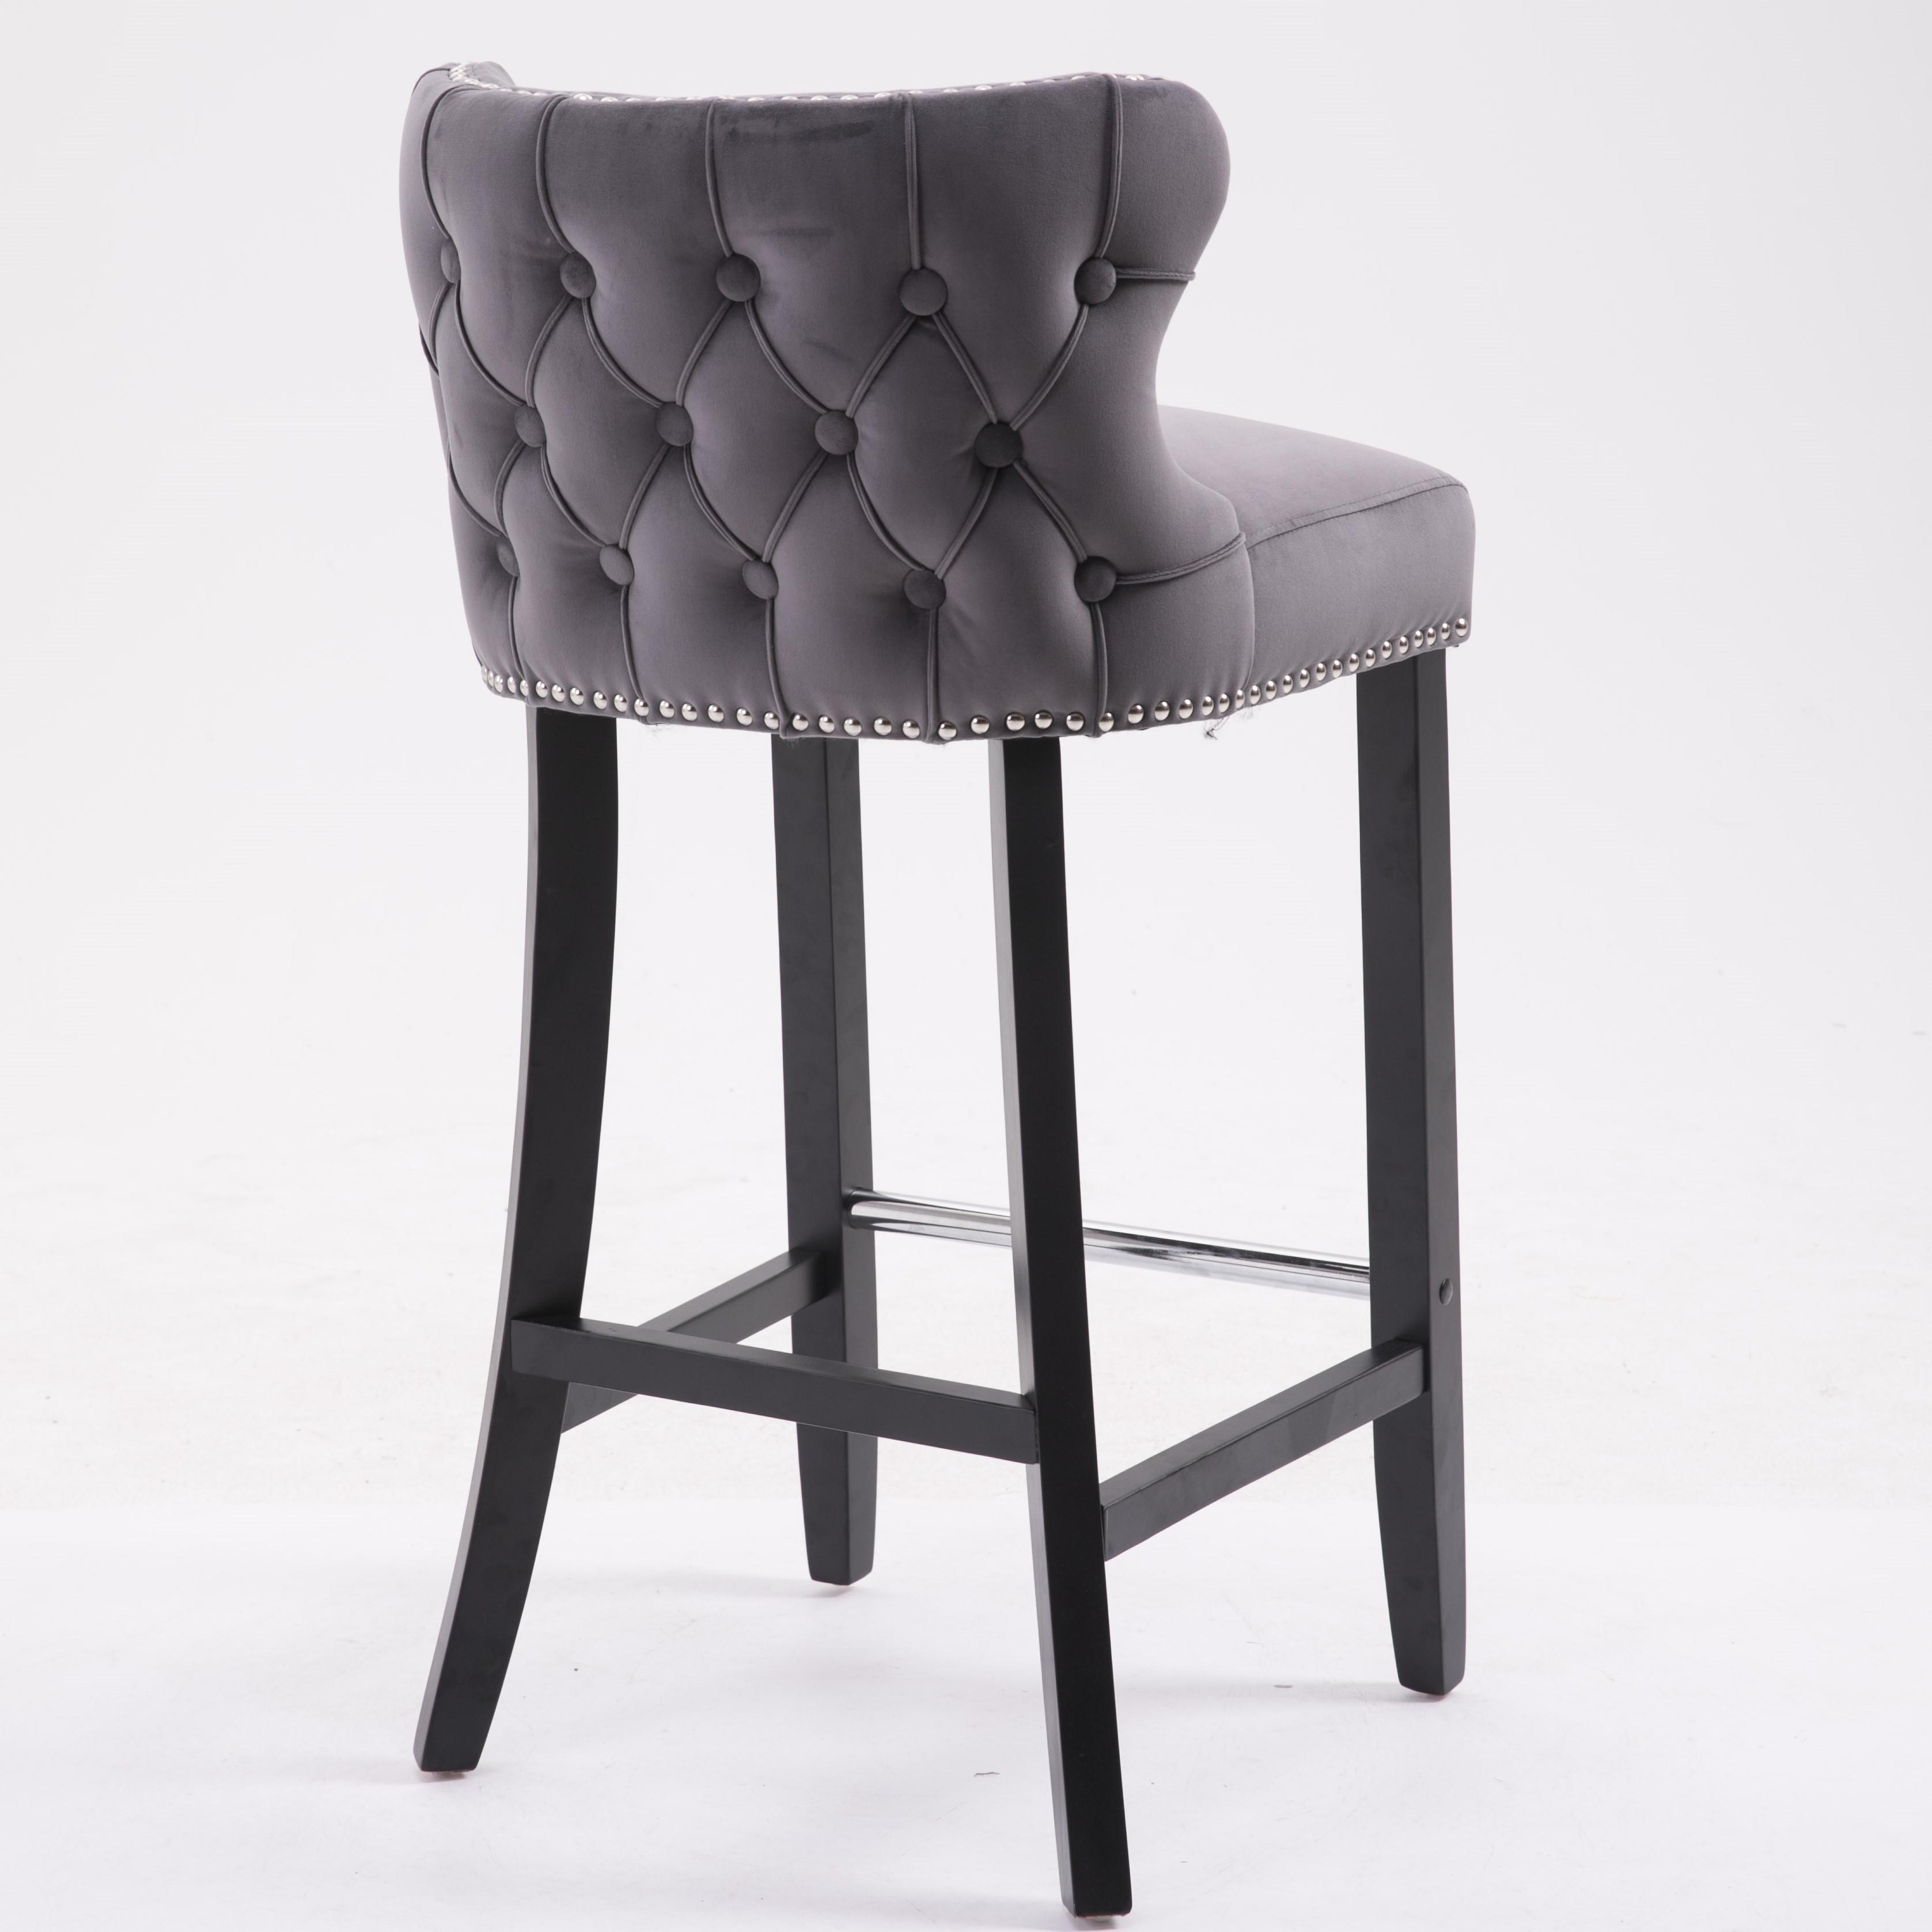 Incredible Solid Wood Leg Bar Stools Counter Stools Bar Chairs Buy Bar Stools Counter Stools High Chair Product On Alibaba Com Uwap Interior Chair Design Uwaporg